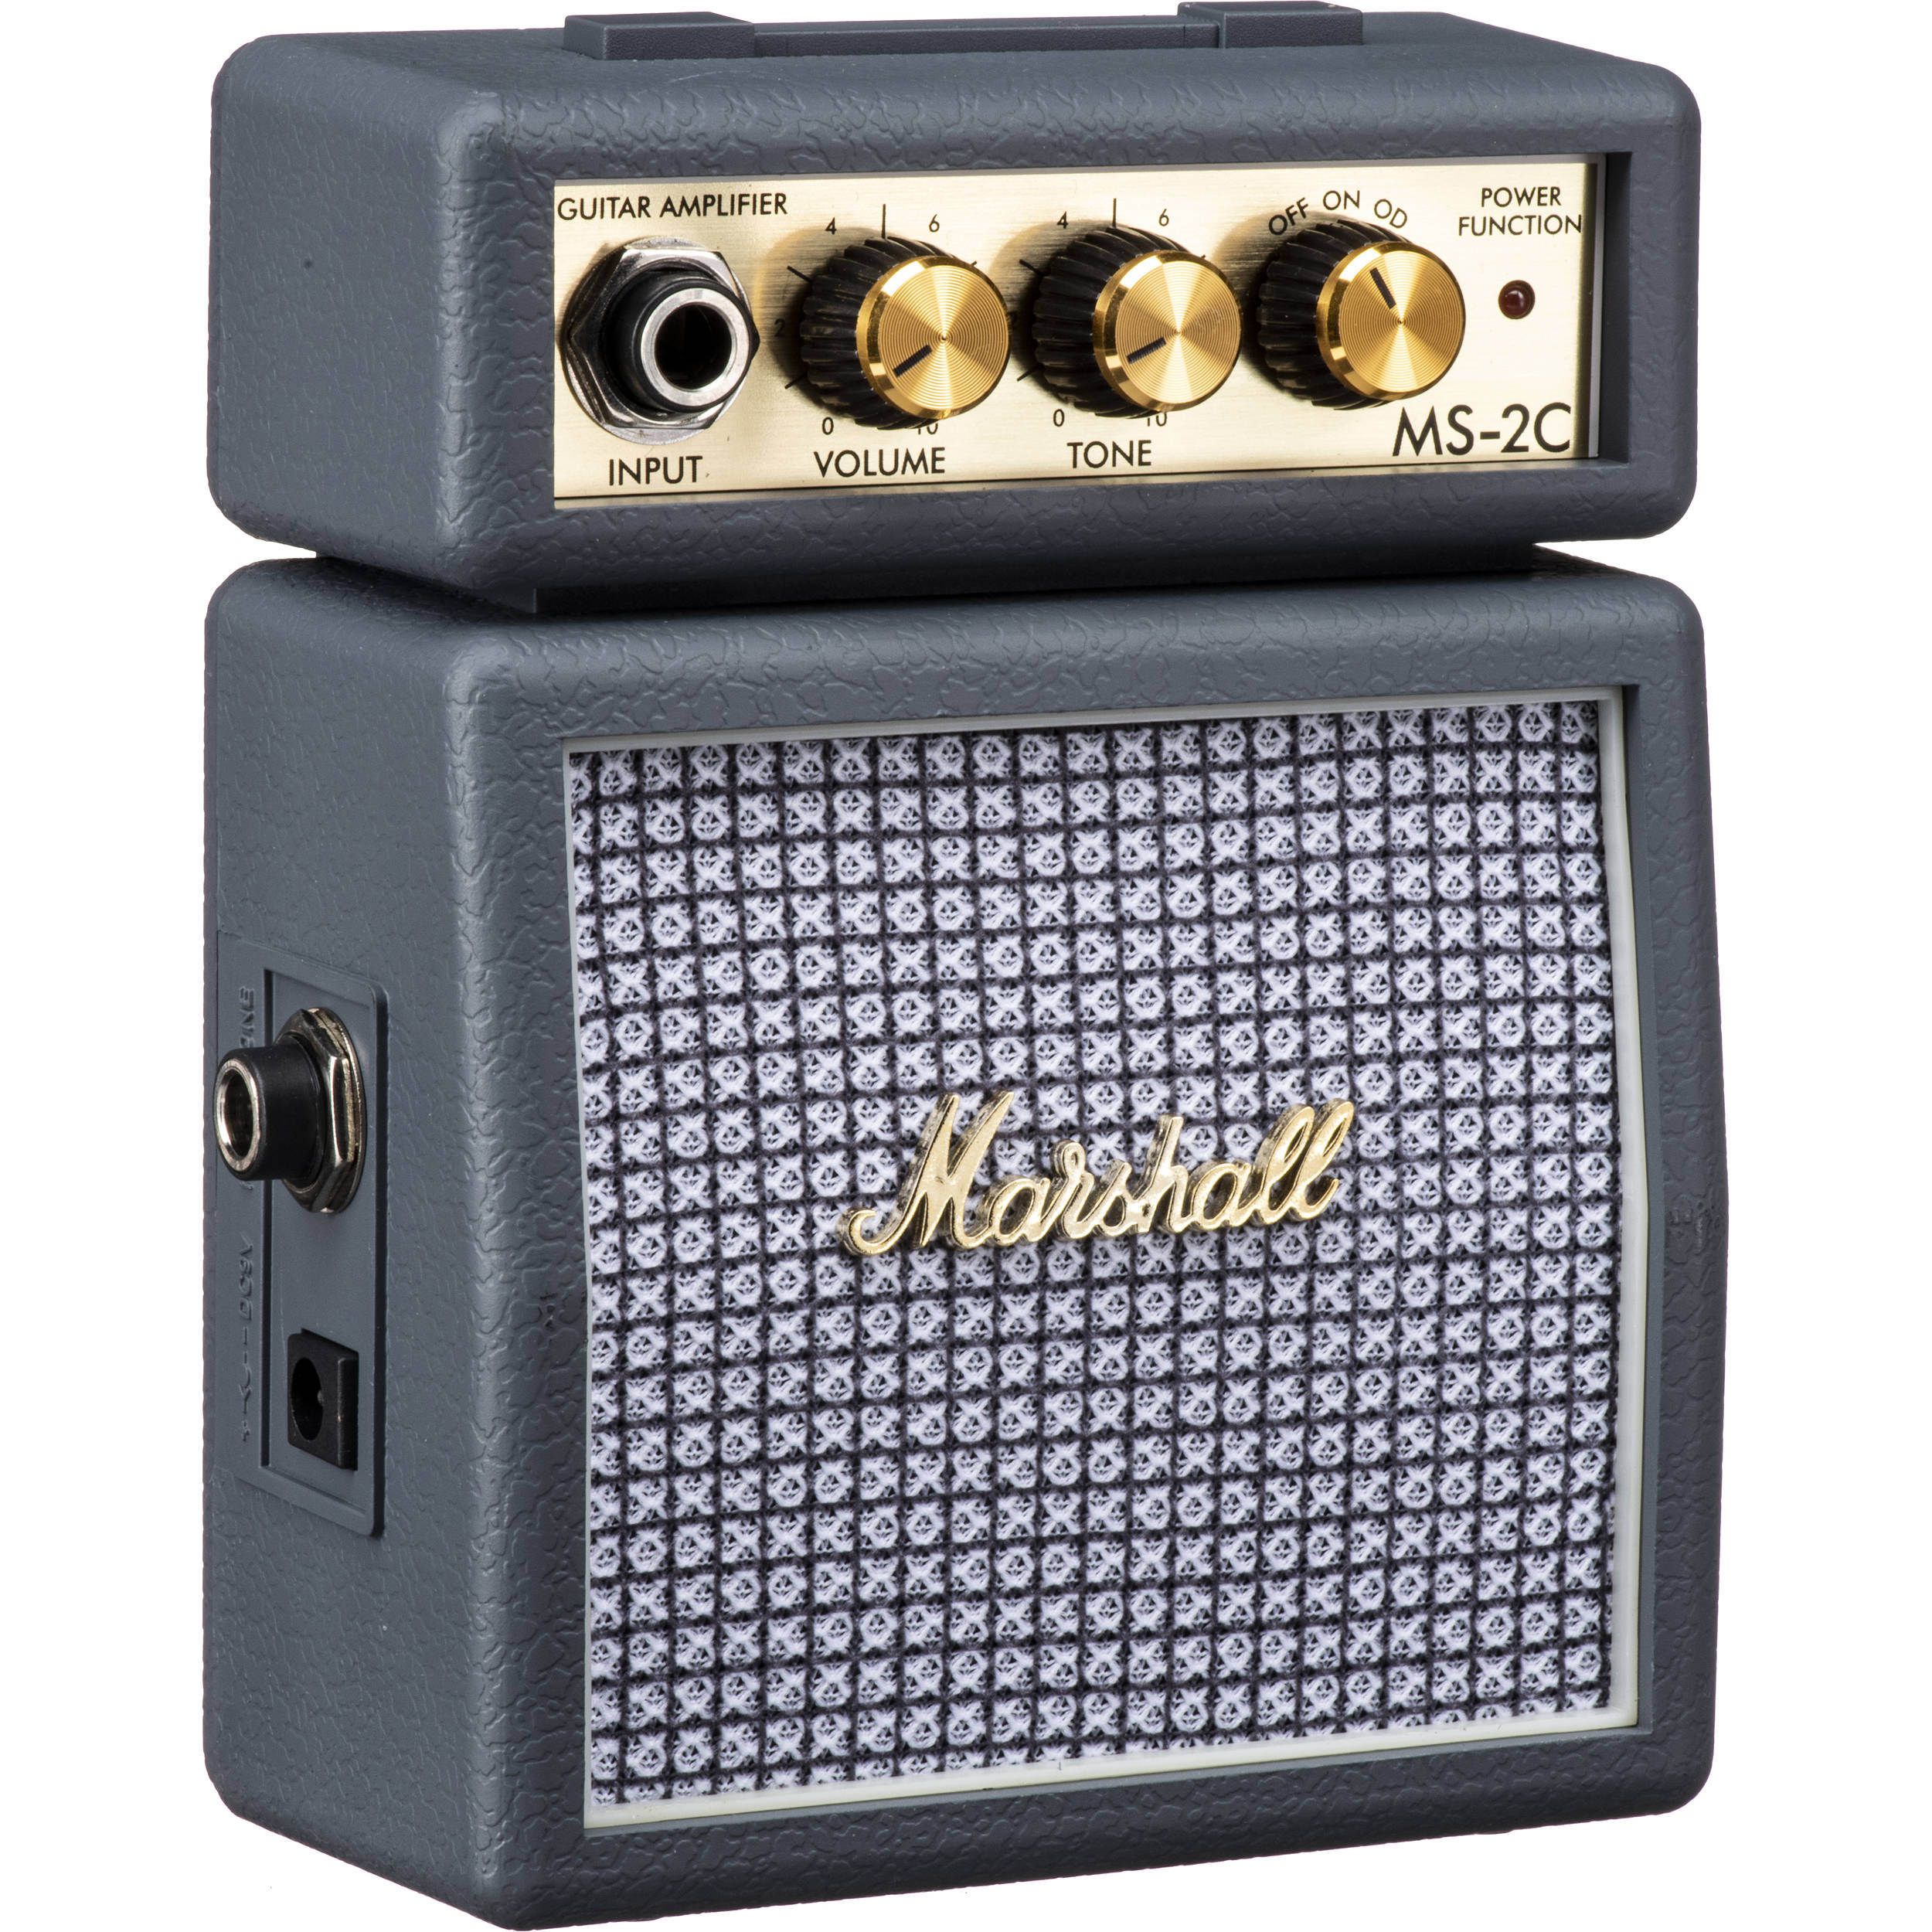 Marshall Mini Amp : marshall amplification ms 2c micro amp mini practice amp ms 2c ~ Russianpoet.info Haus und Dekorationen